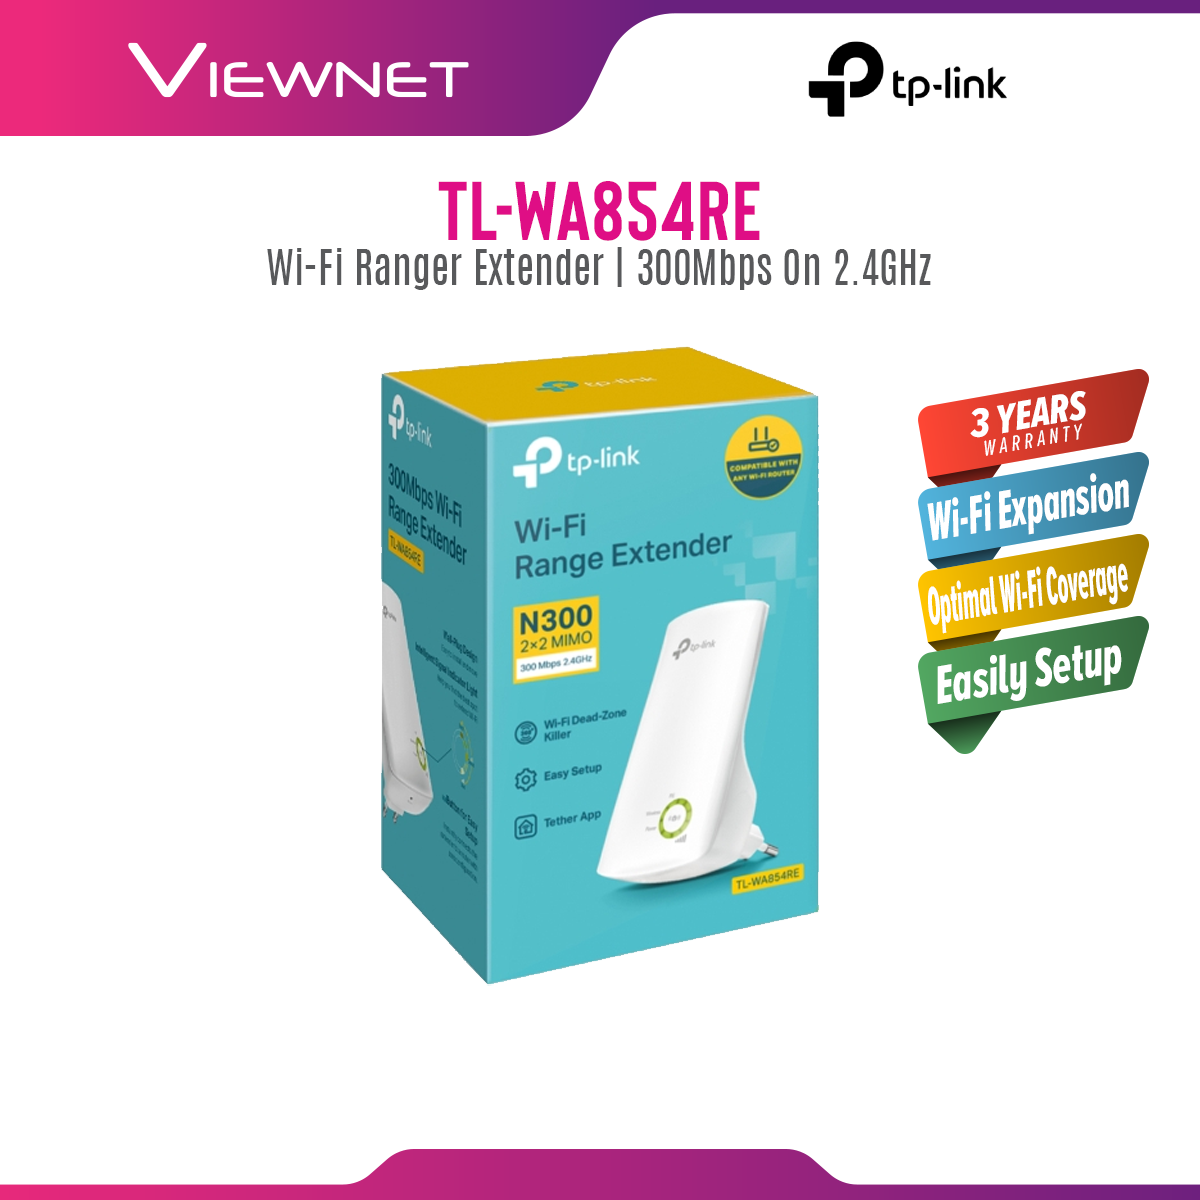 TP-LINK TL-WA850RE / TL-WA854RE Wireless N300 Repeater WiFi Wireless Booster Tplink Wi-Fi Range Extender WA850RE WA854RE